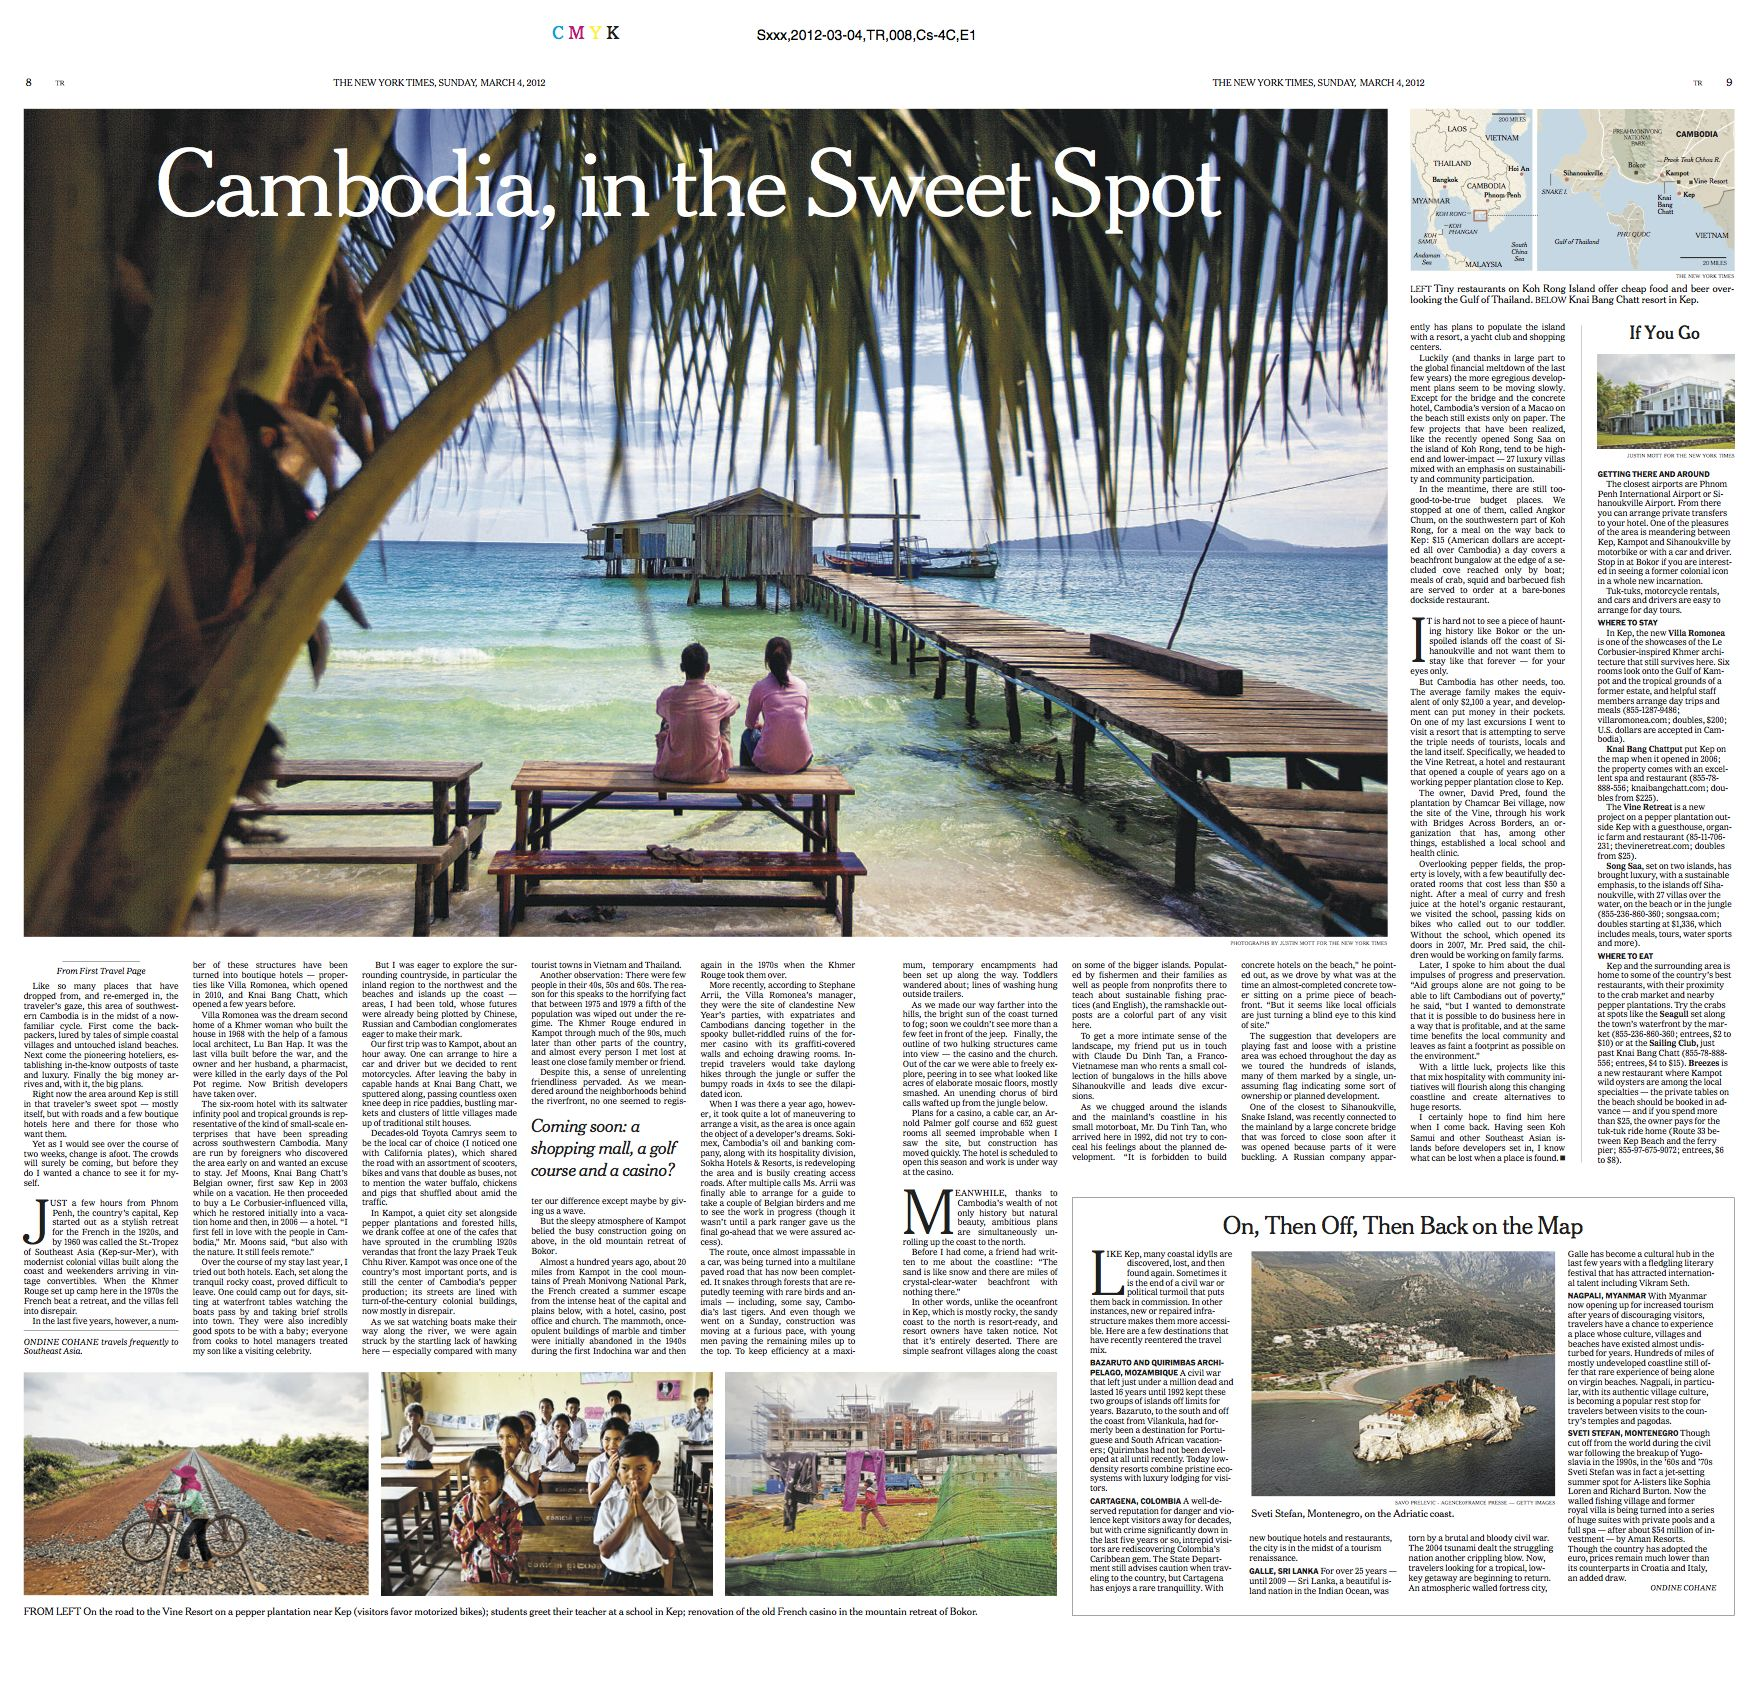 Justin_Mott_Cambodia_New_York_Times_Travel-1.jpg